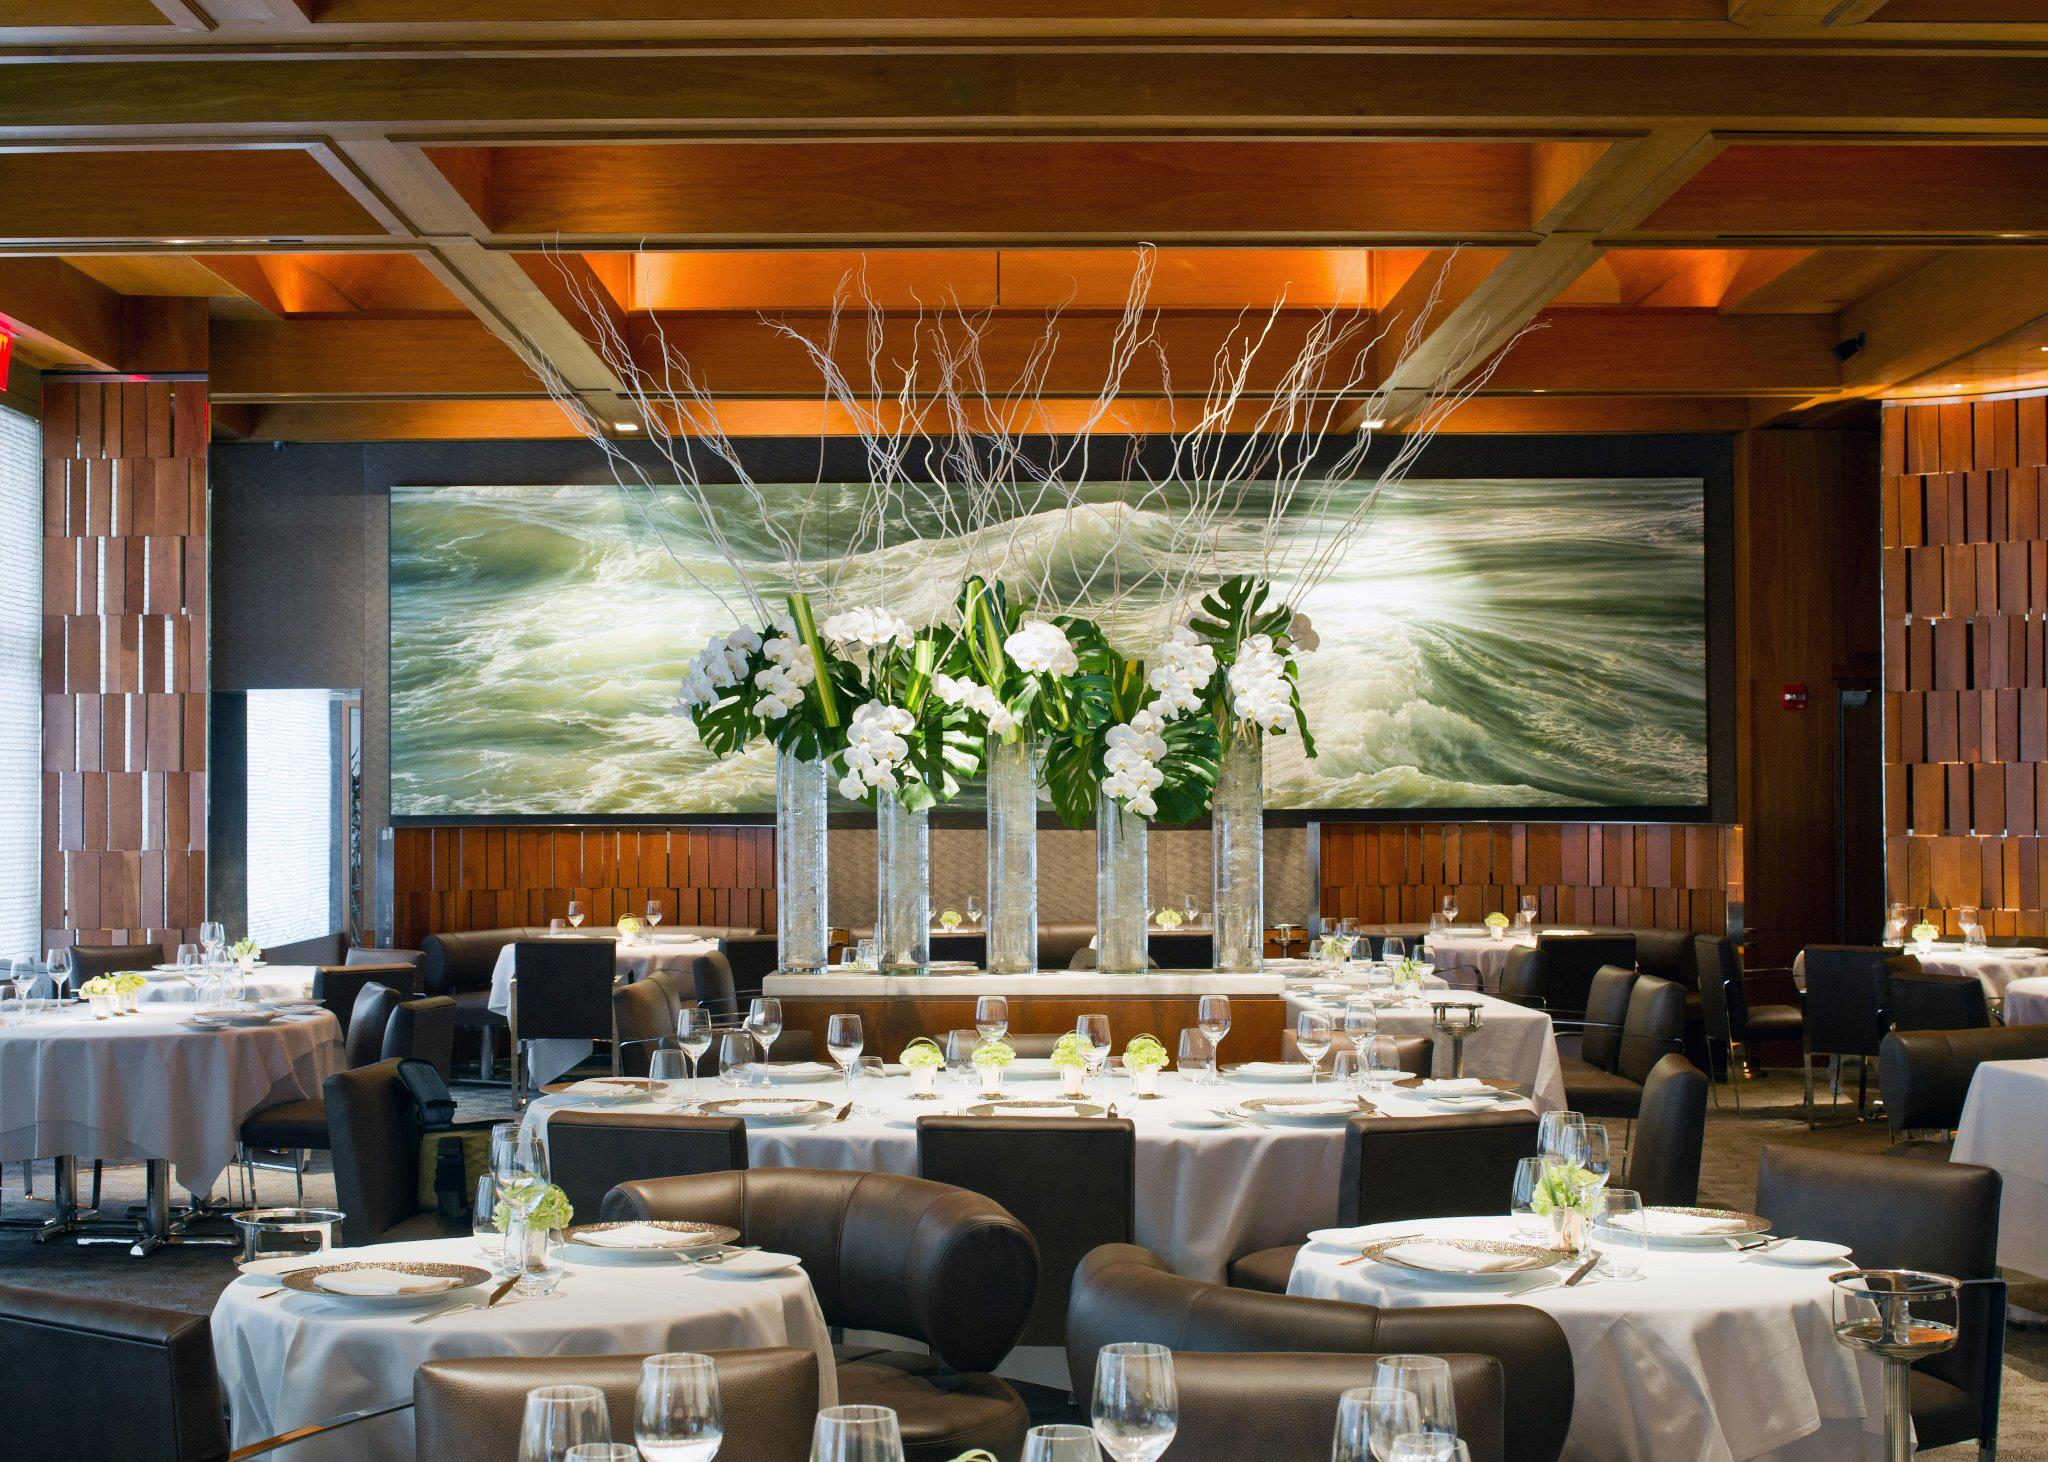 2017 Nyc Restaurants The Winners